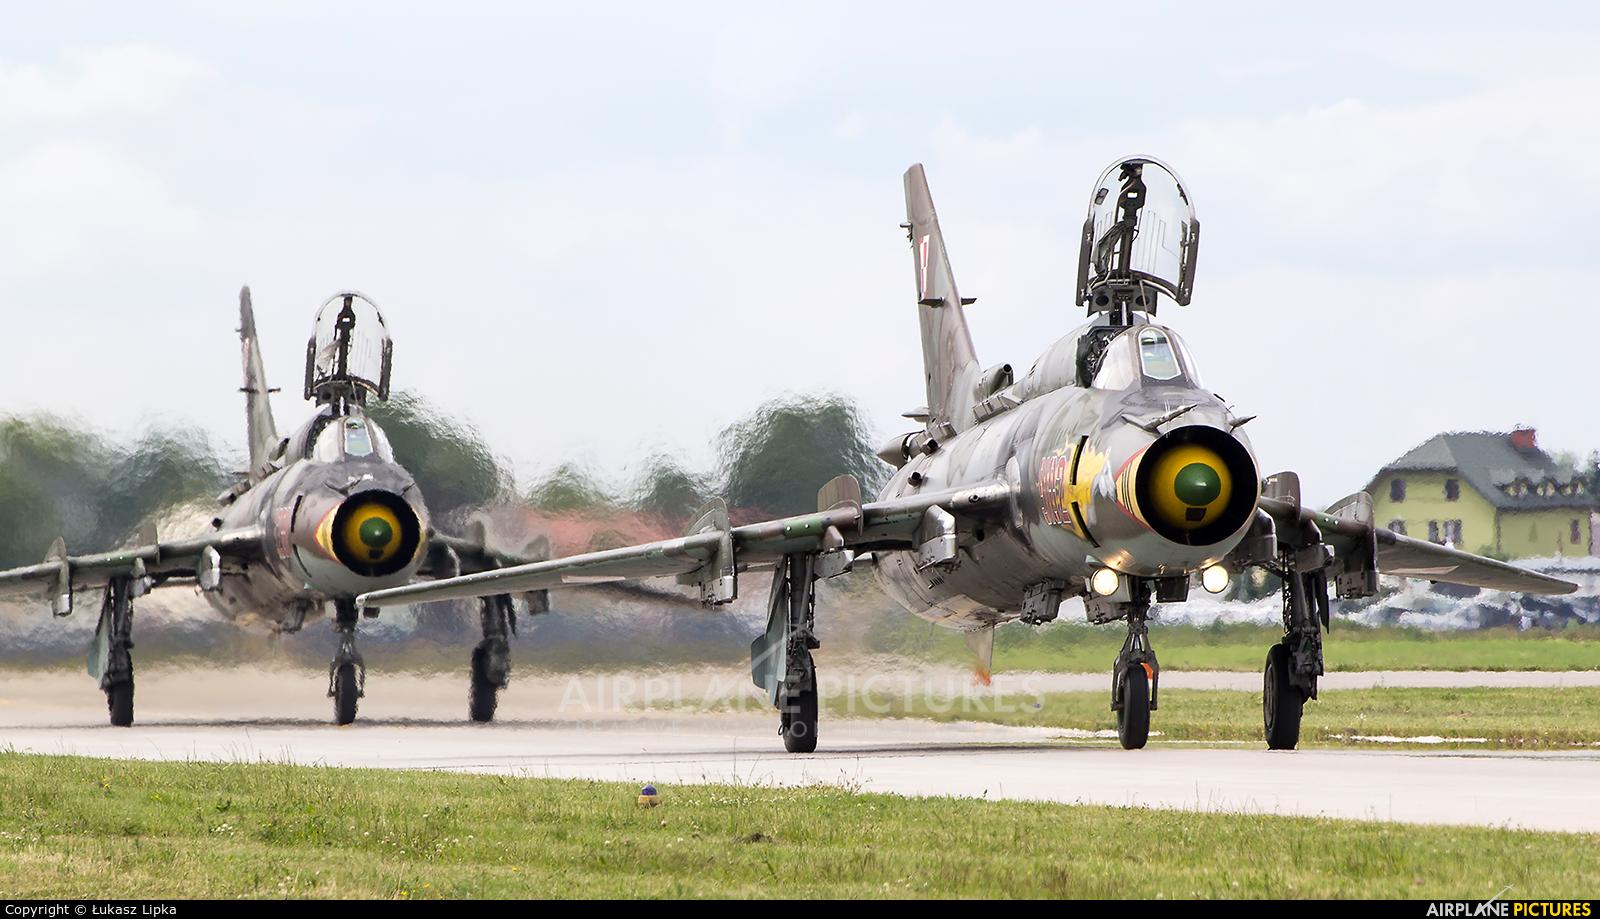 Poland - Air Force 9102 aircraft at Dęblin